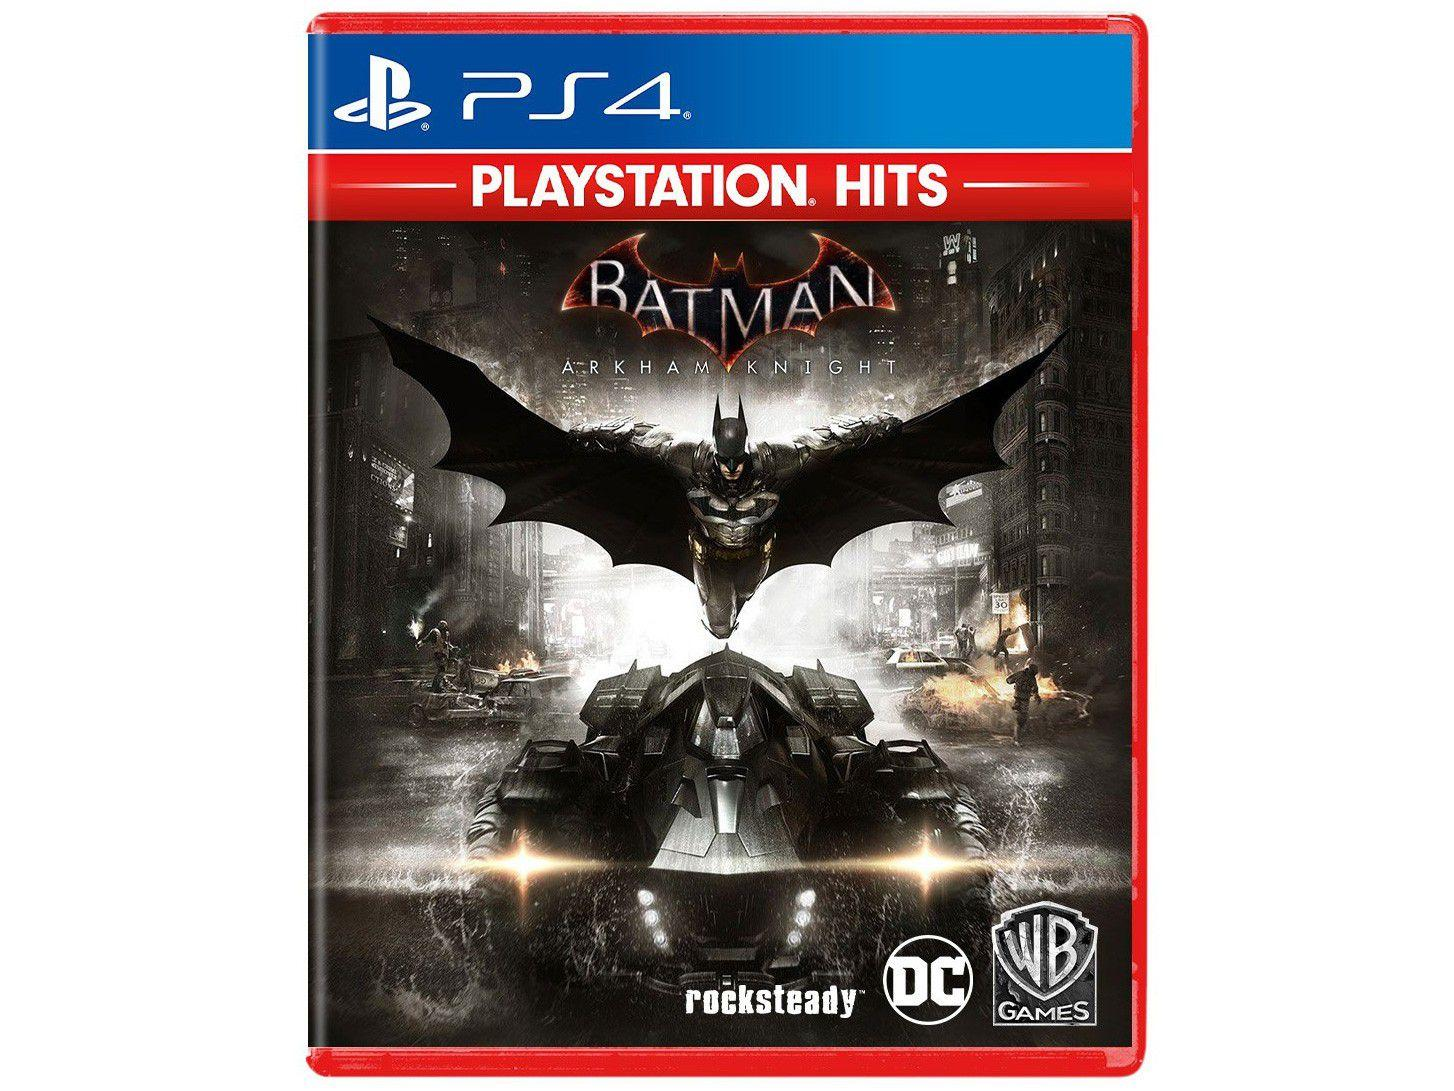 Batman Arkham Knight para PS4 Rocksteady Studios - Playstation Hits